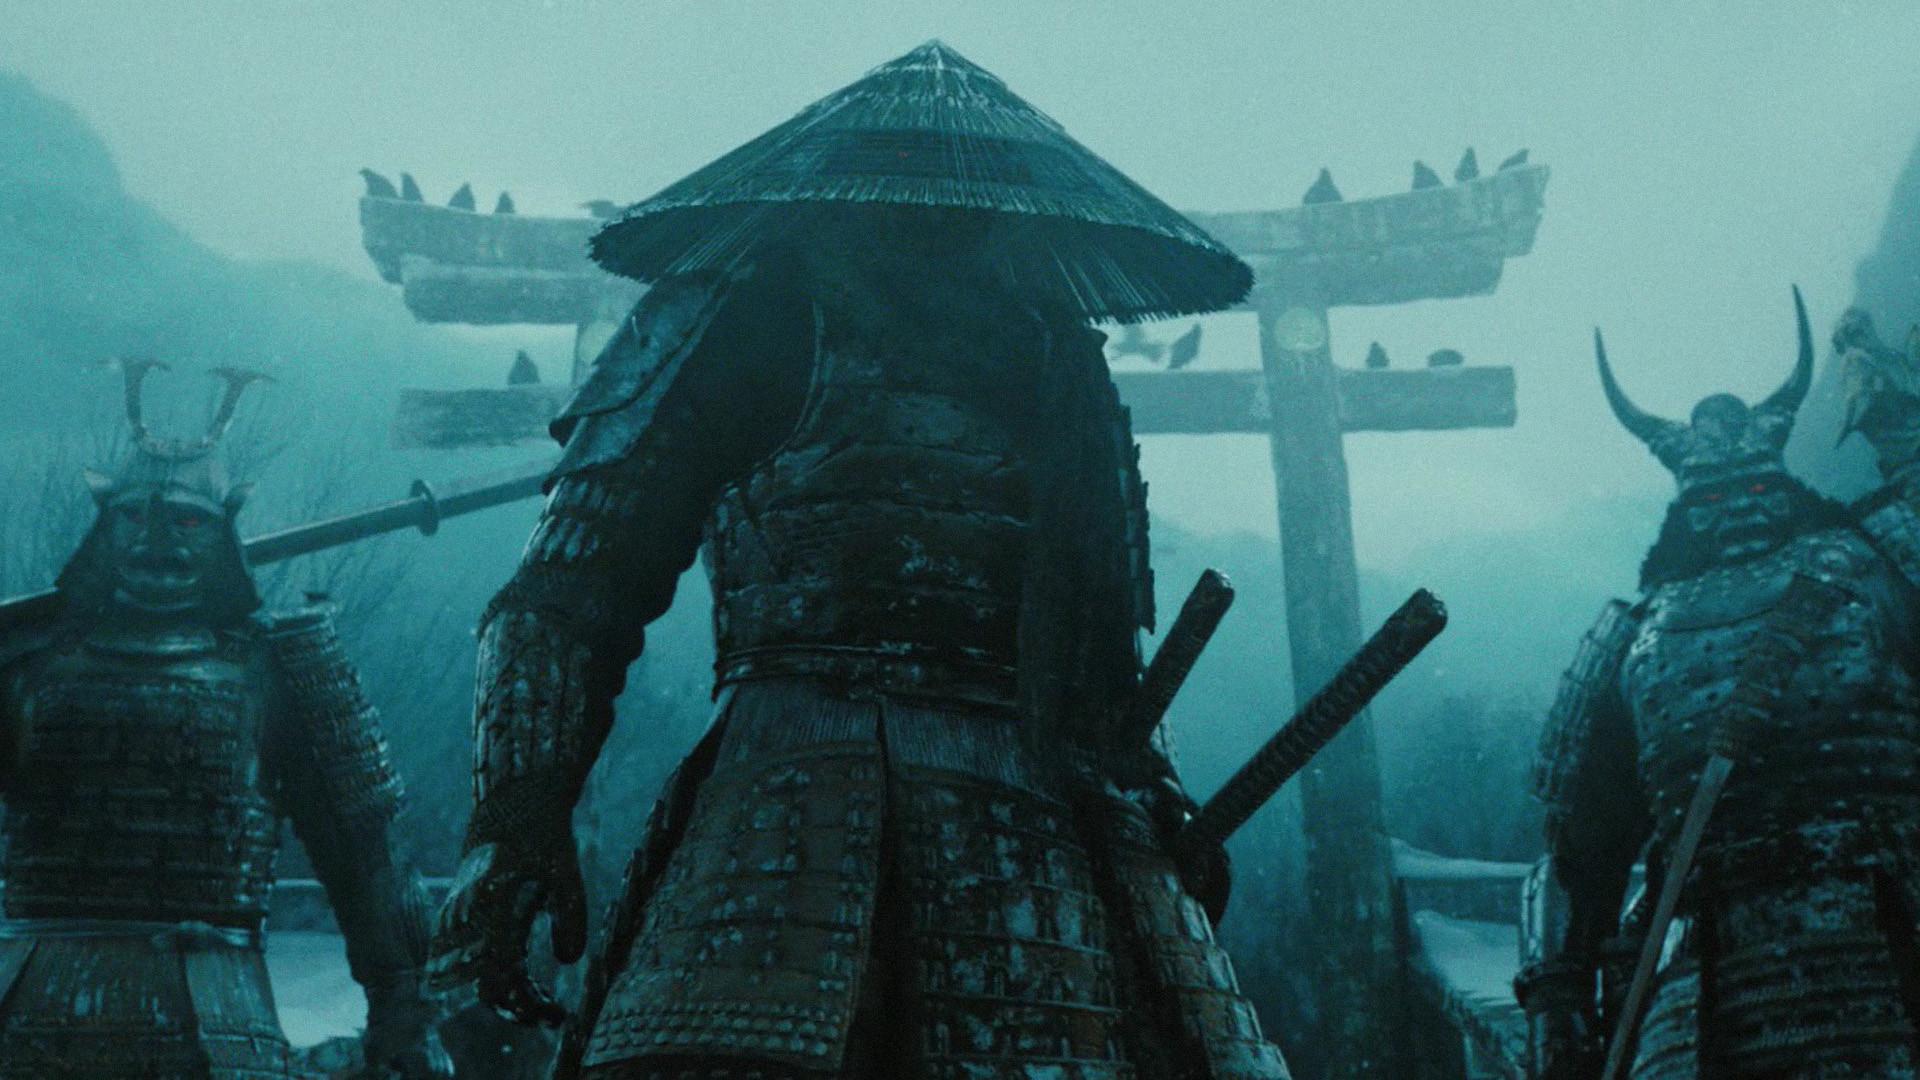 Res: 1920x1080, Awesome samurai wallpaper